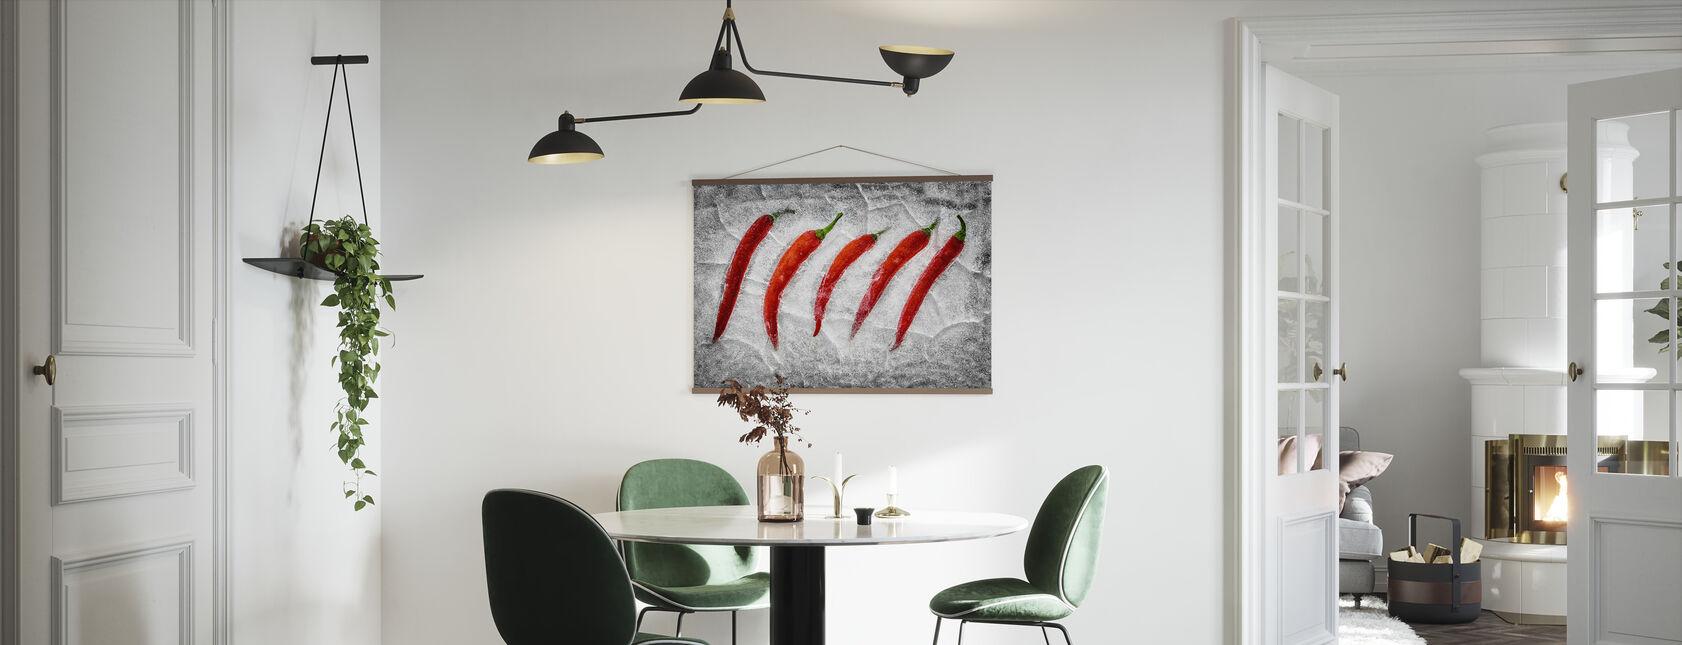 Bevroren vuur - Poster - Keuken